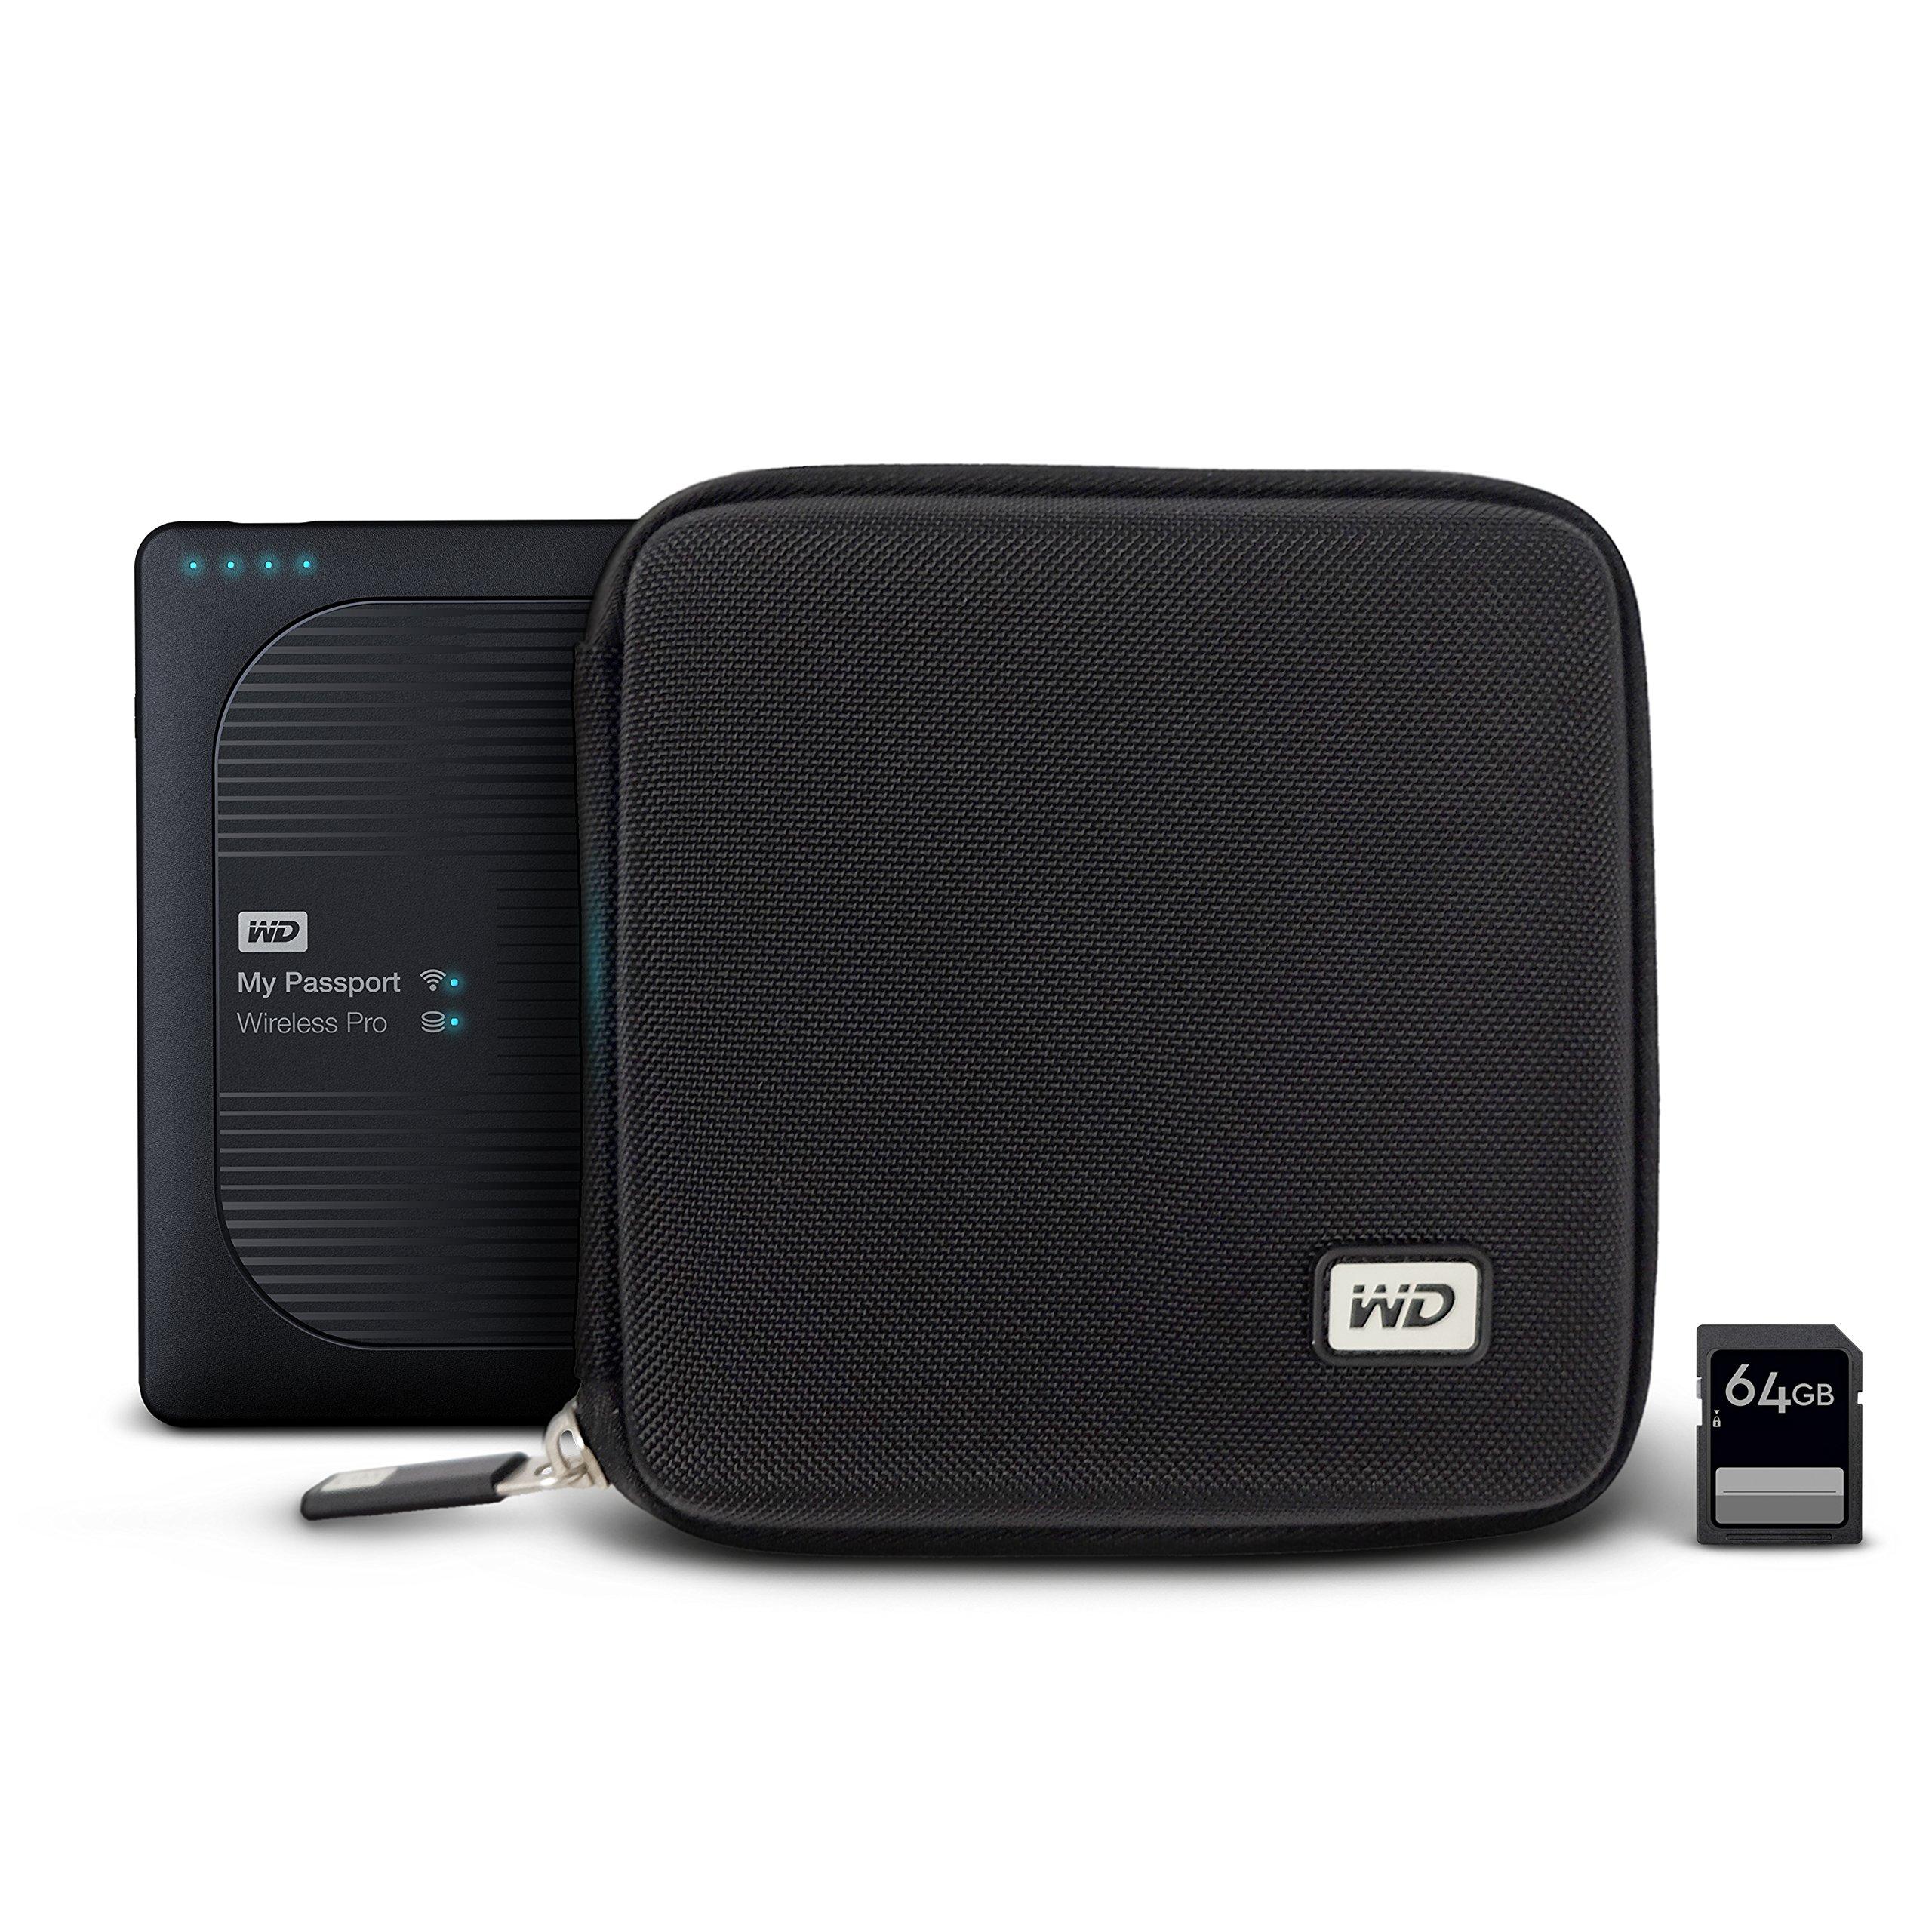 WD My Passport Wireless Pro - Funda rígida con Ranuras para Tarjetas SD, Color Negro